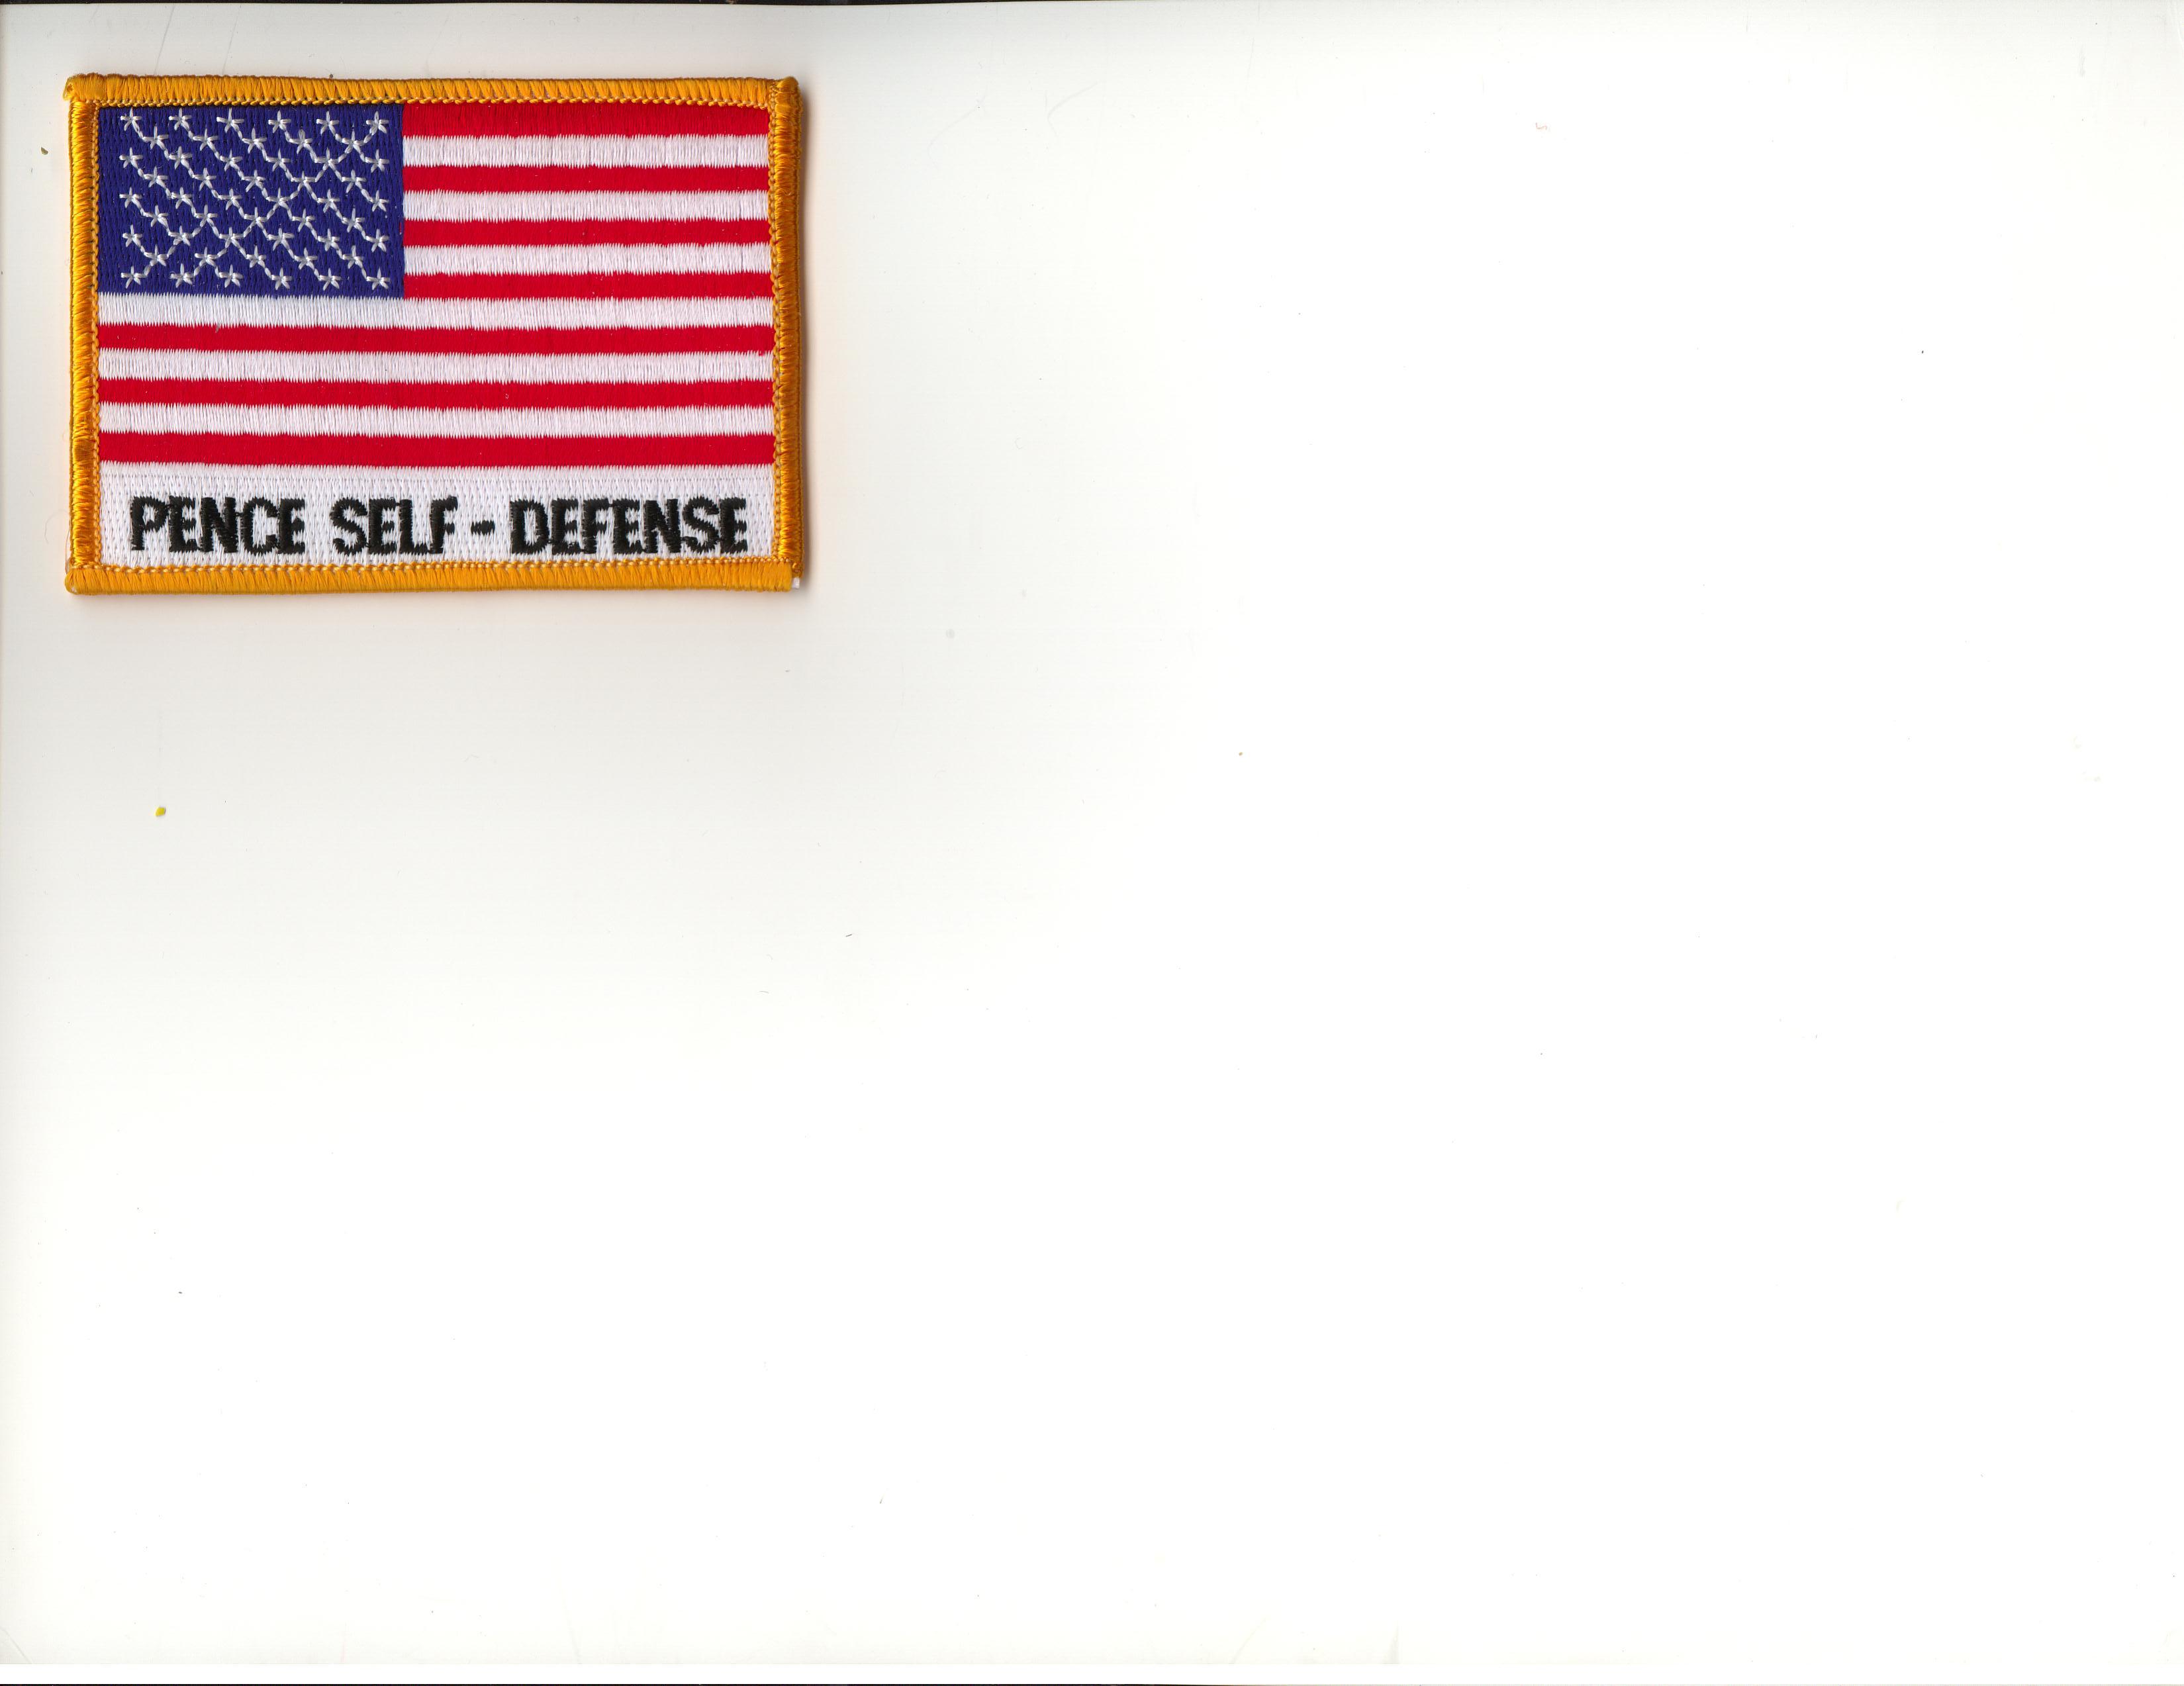 FLAGPENCE.jpg